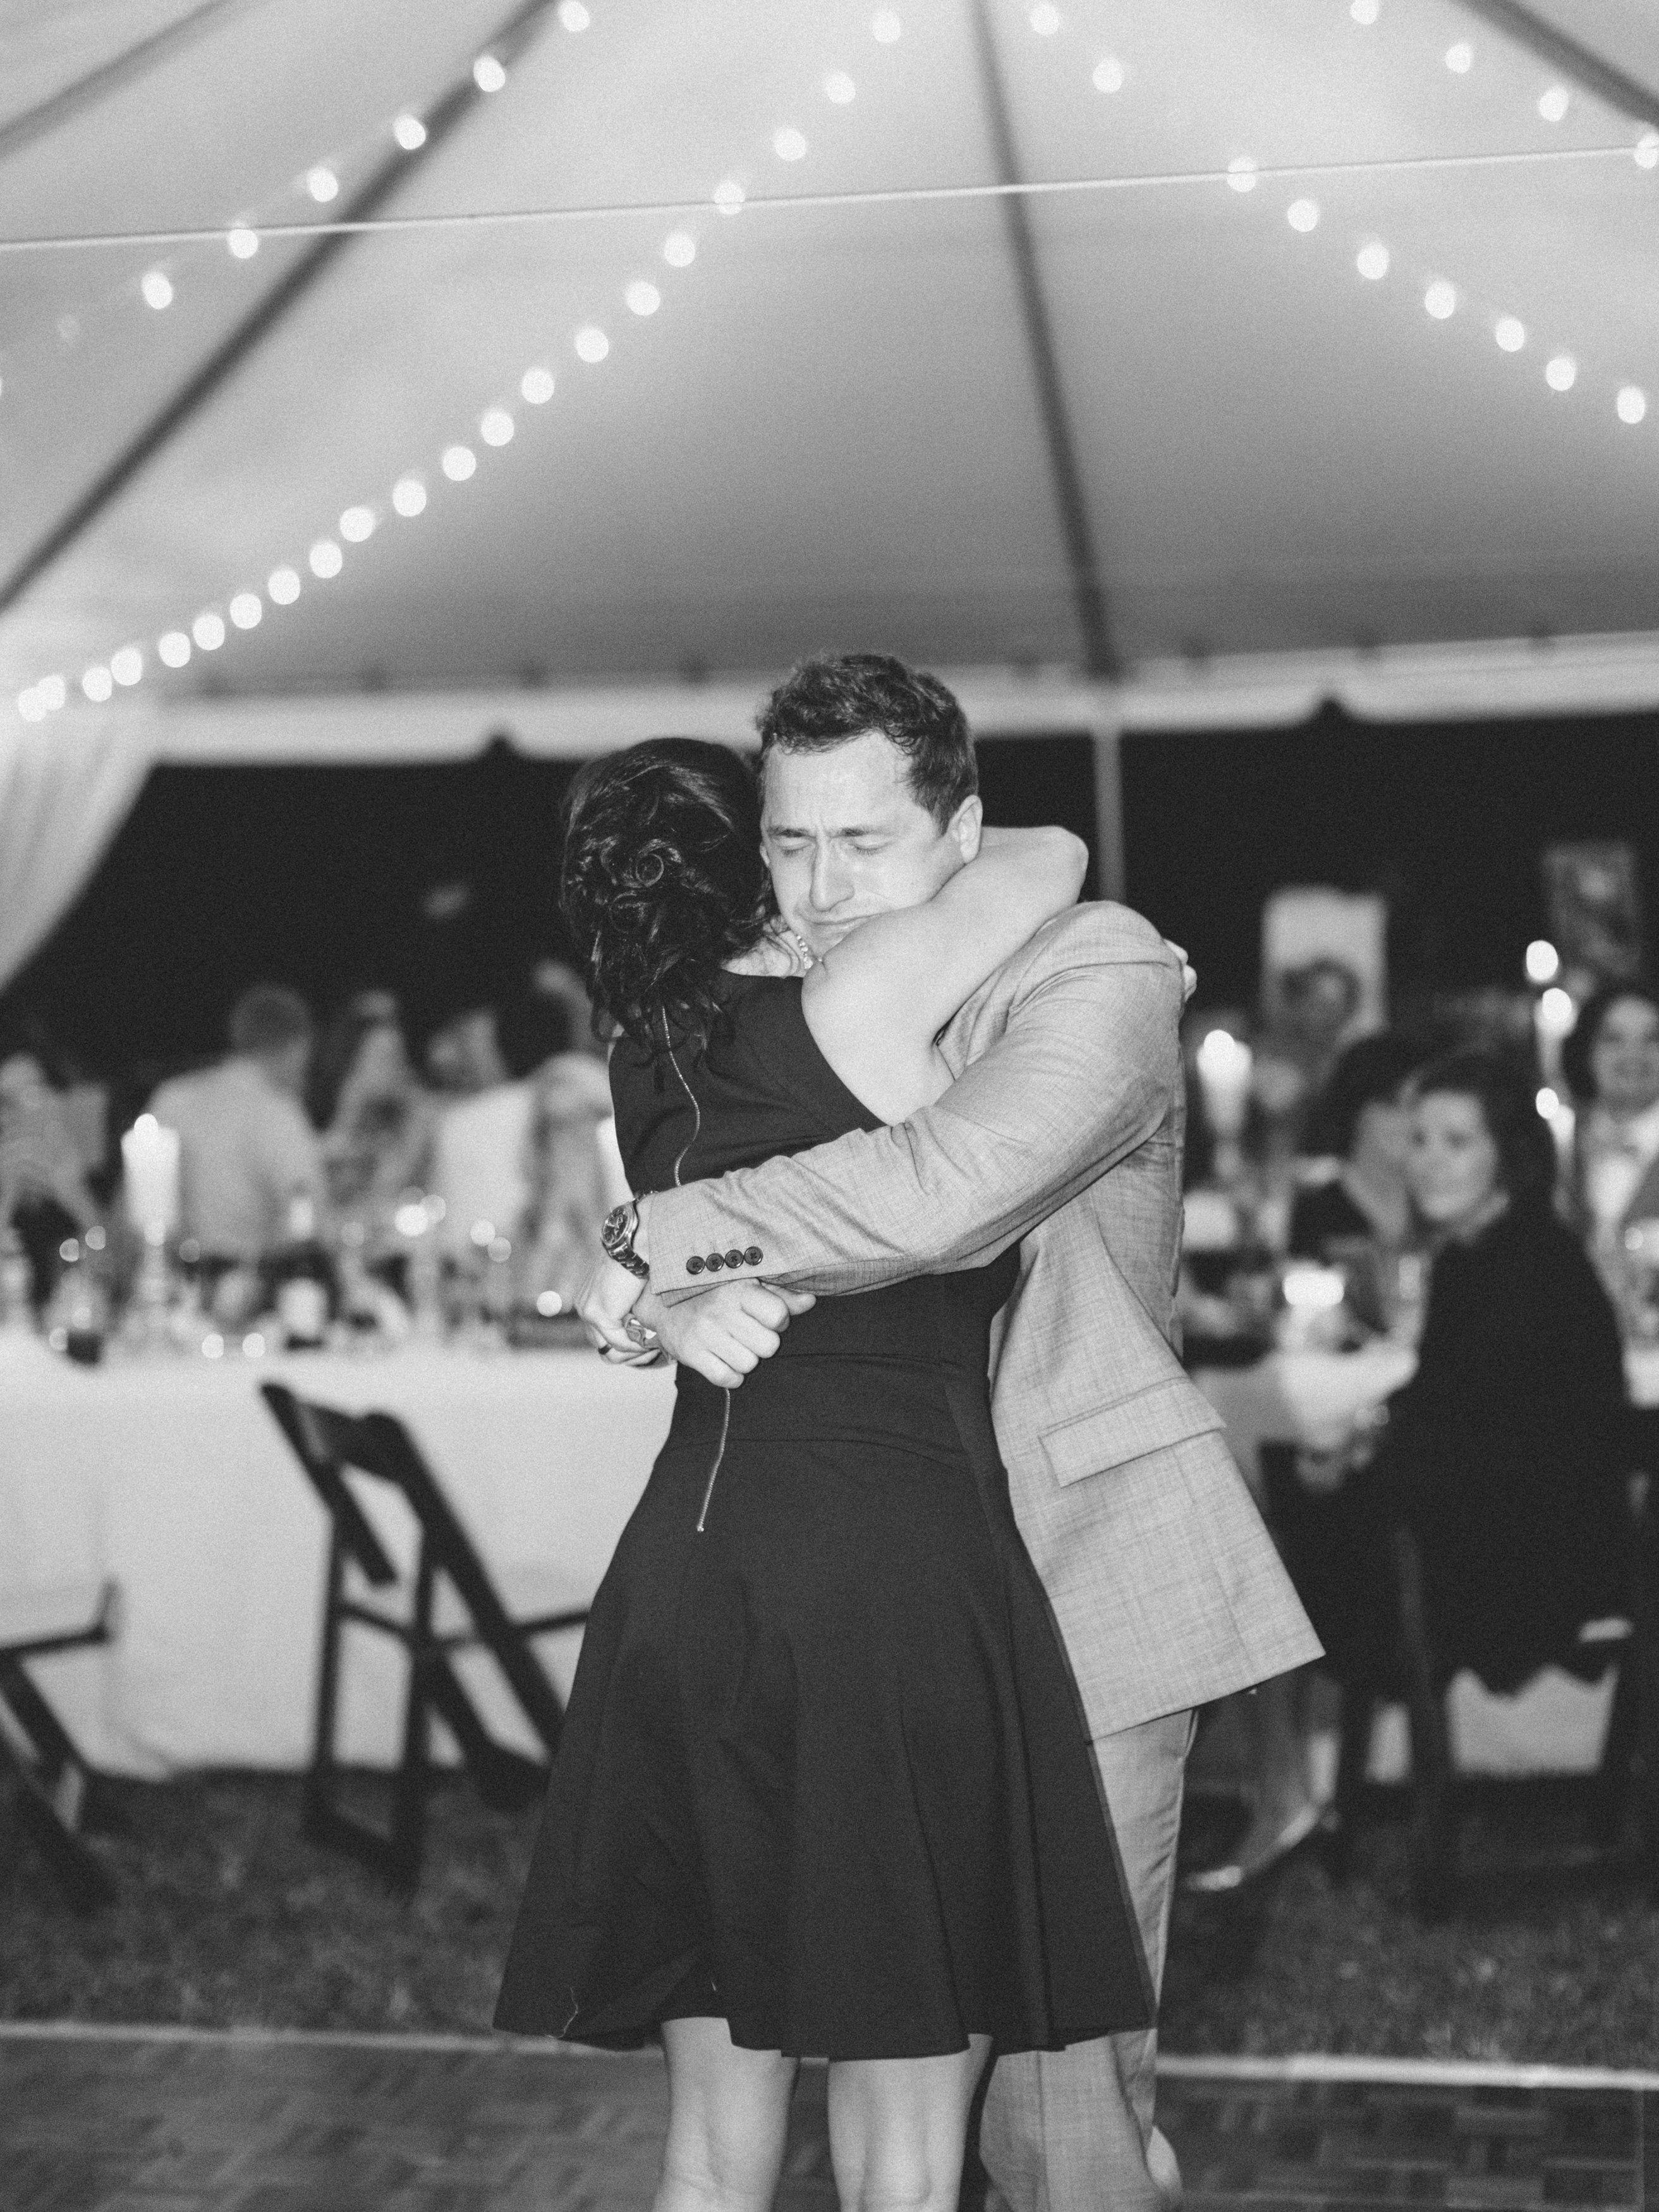 Precious Motherson Dance Wedding Tent Reception The Most